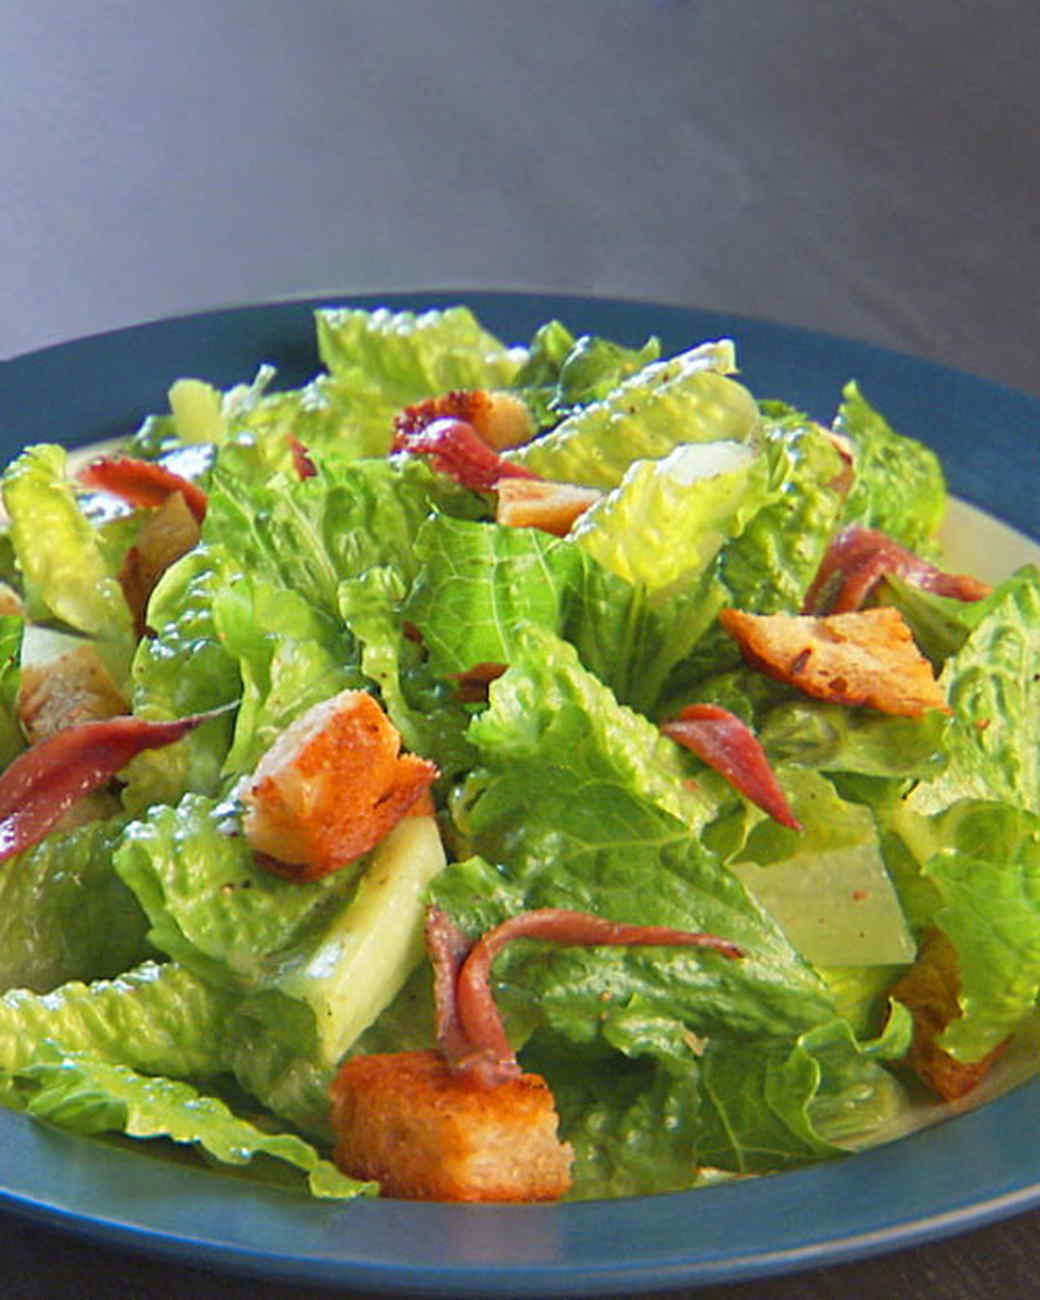 mh_1028_salad.jpg